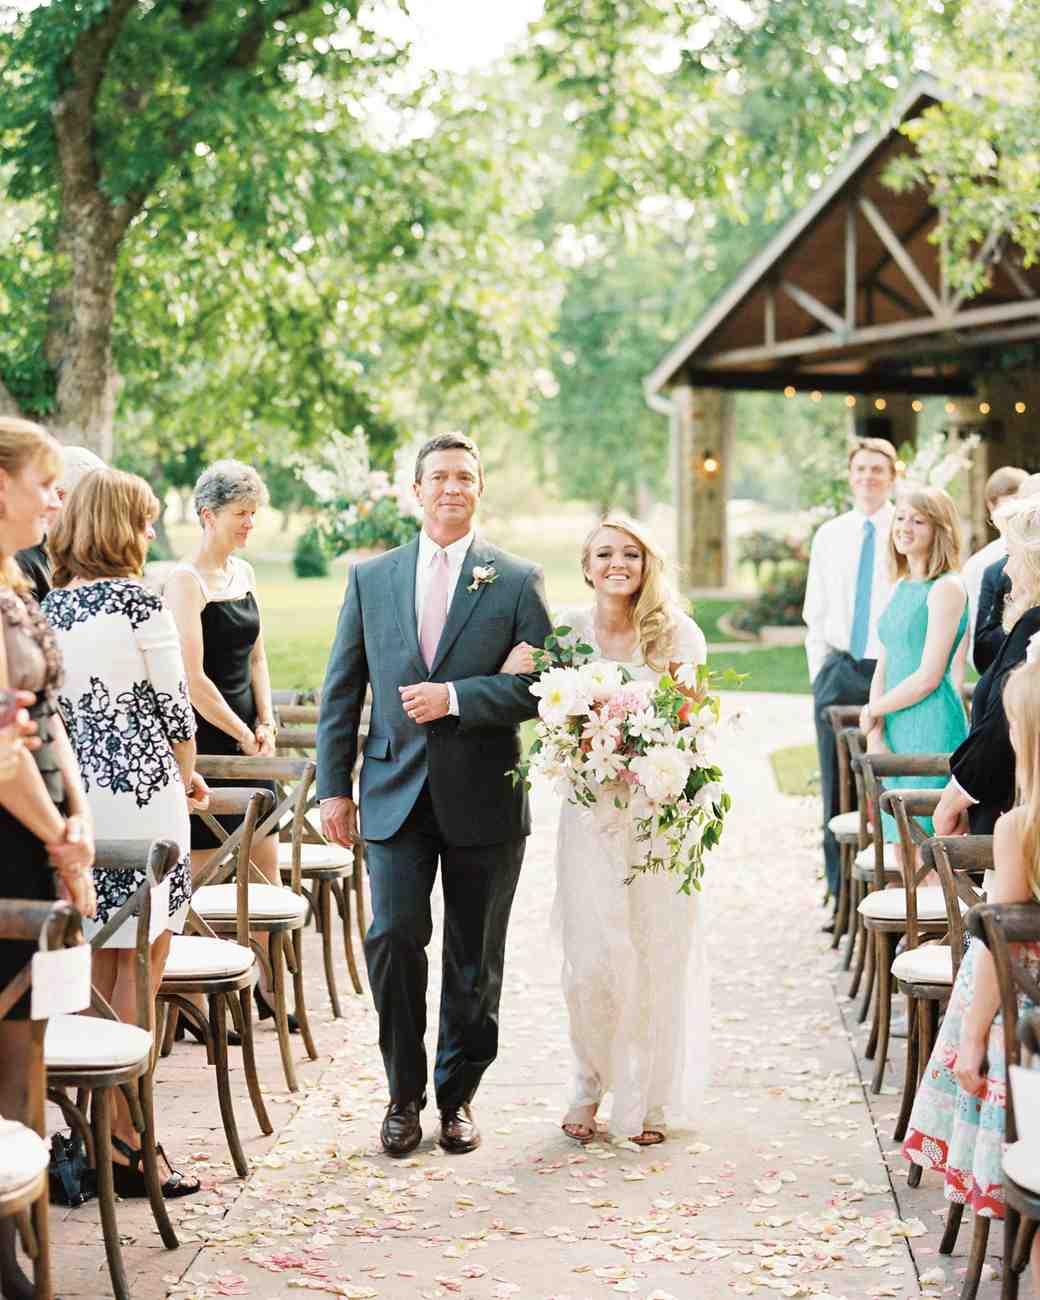 david-tyler-real-wedding-bride-dad-walking-down-aisle.jpg